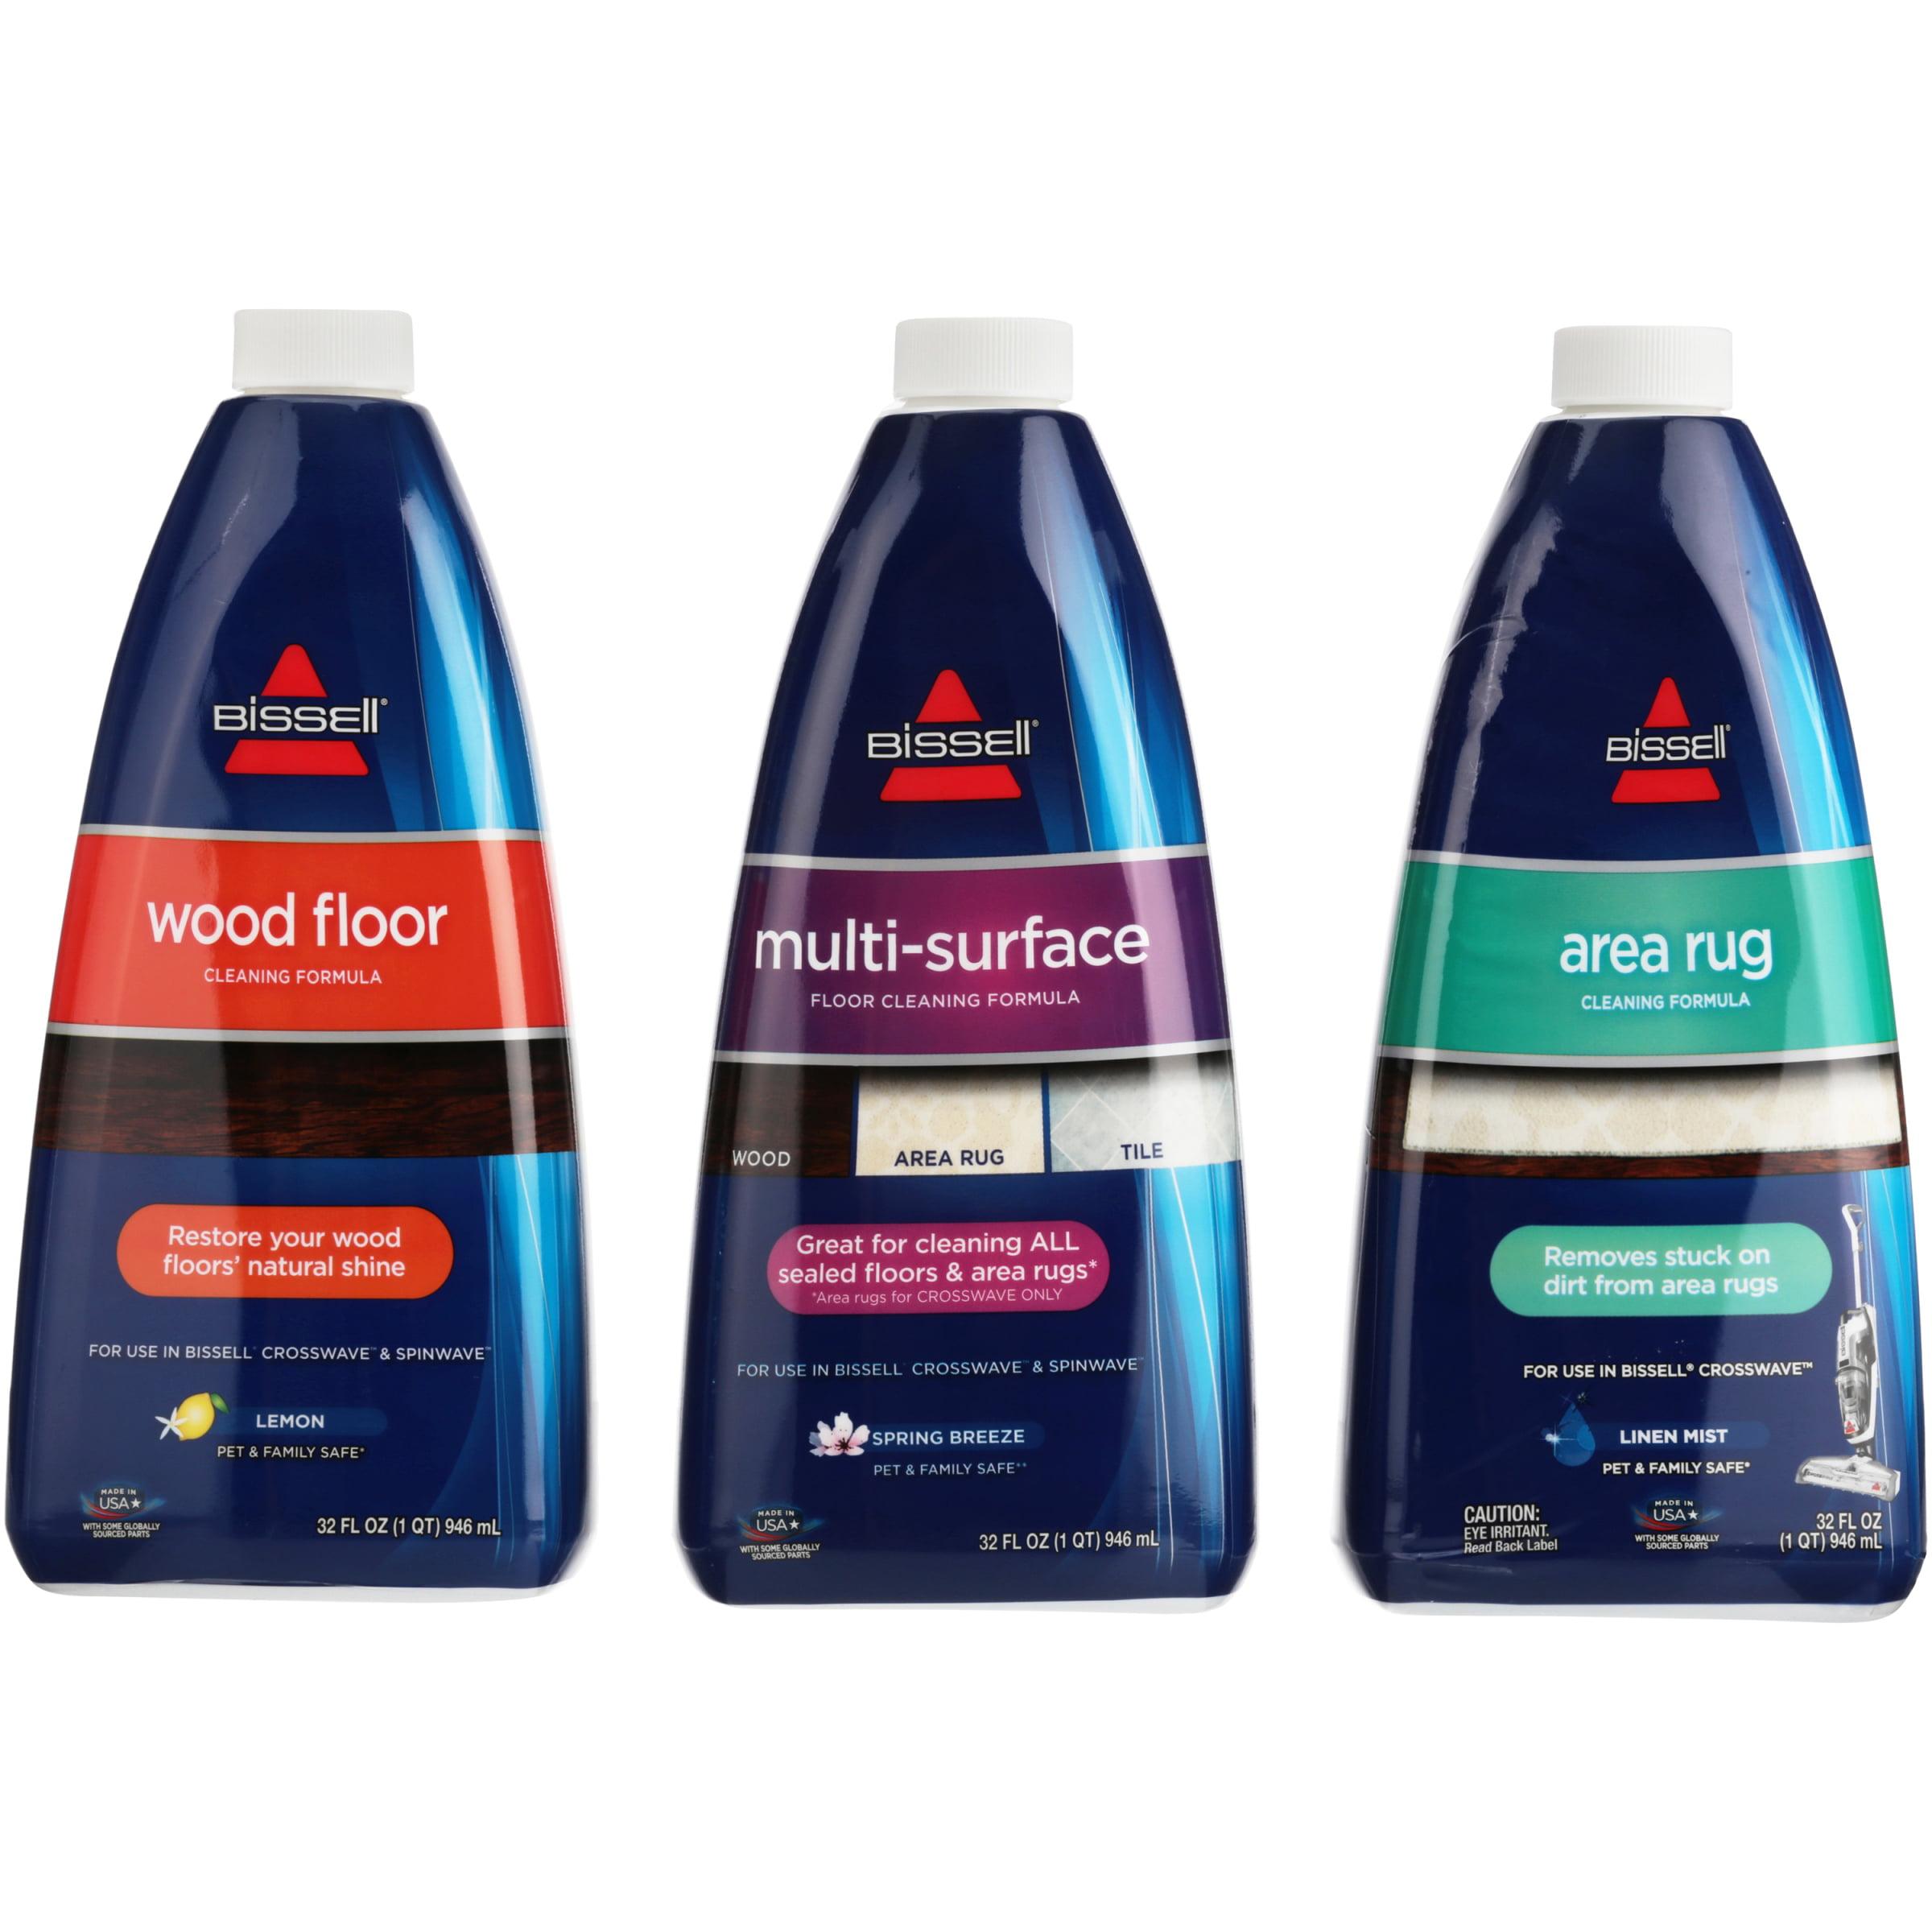 Bissell® Wood Floor, Multi-Surface Floor & Area Rug Cleaning Formula Variety Pack 3-32 fl. oz. Bottles